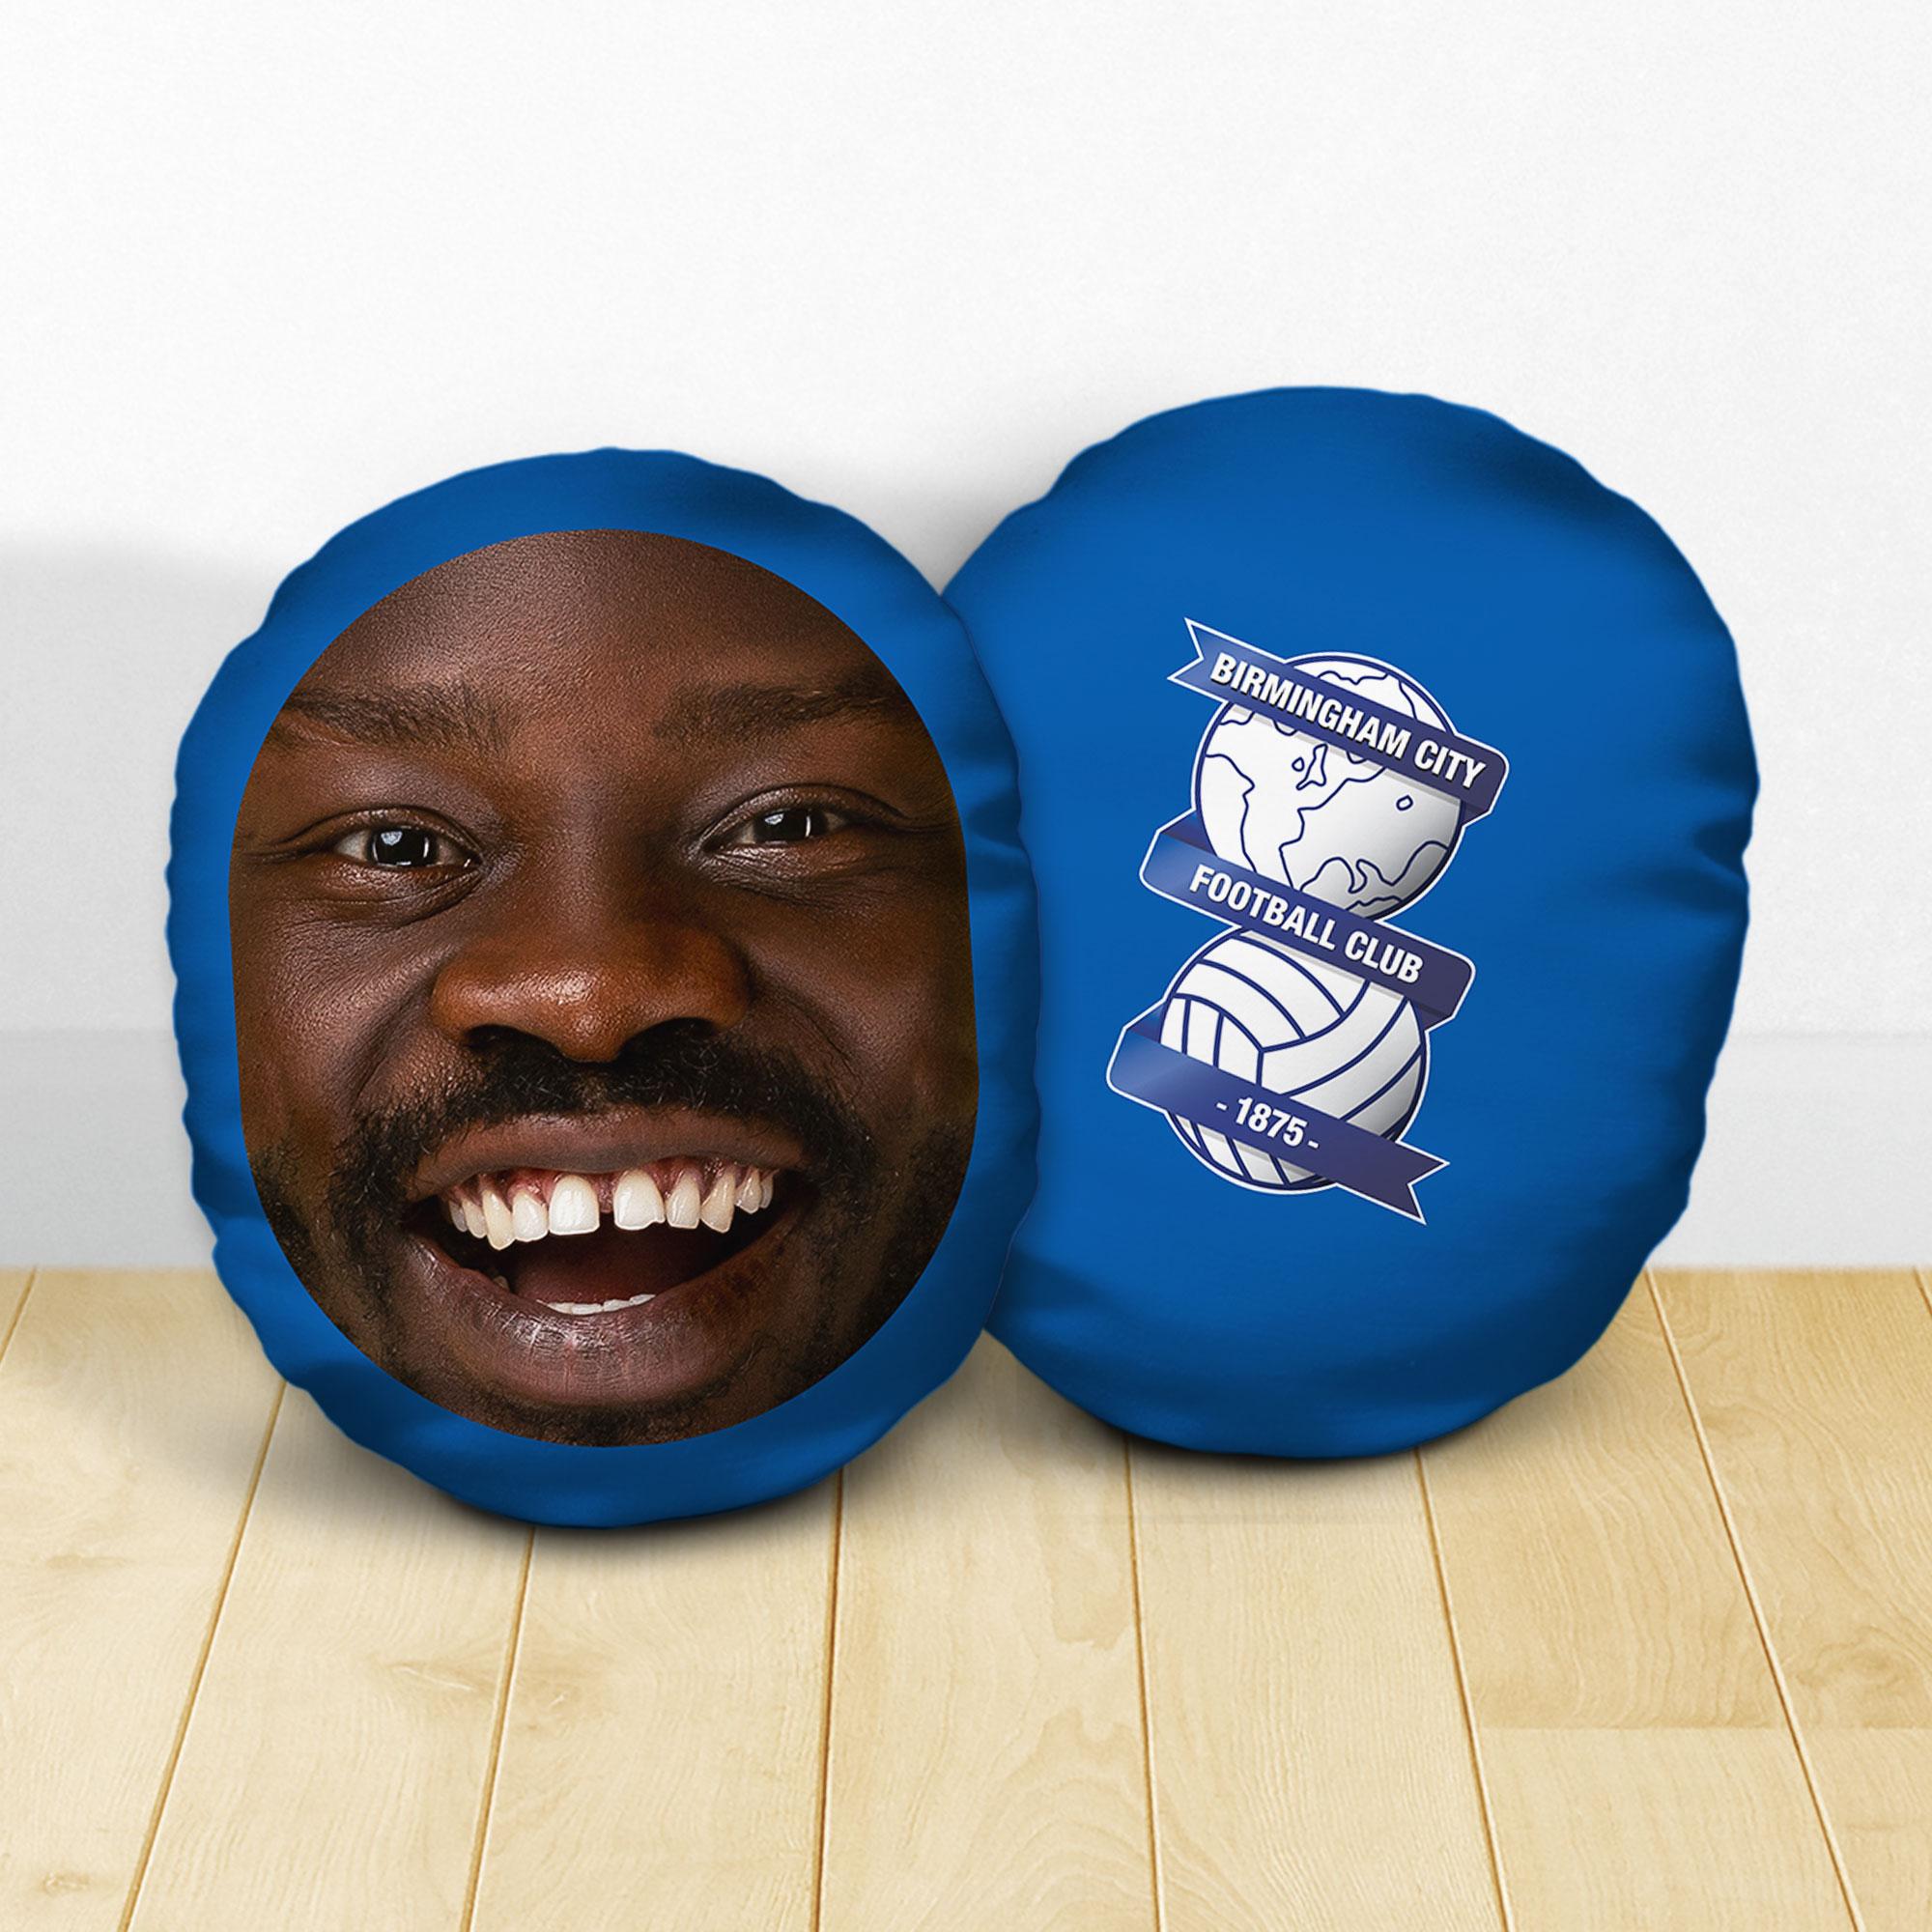 Personalised Birmingham City FC Crest Mush Cush